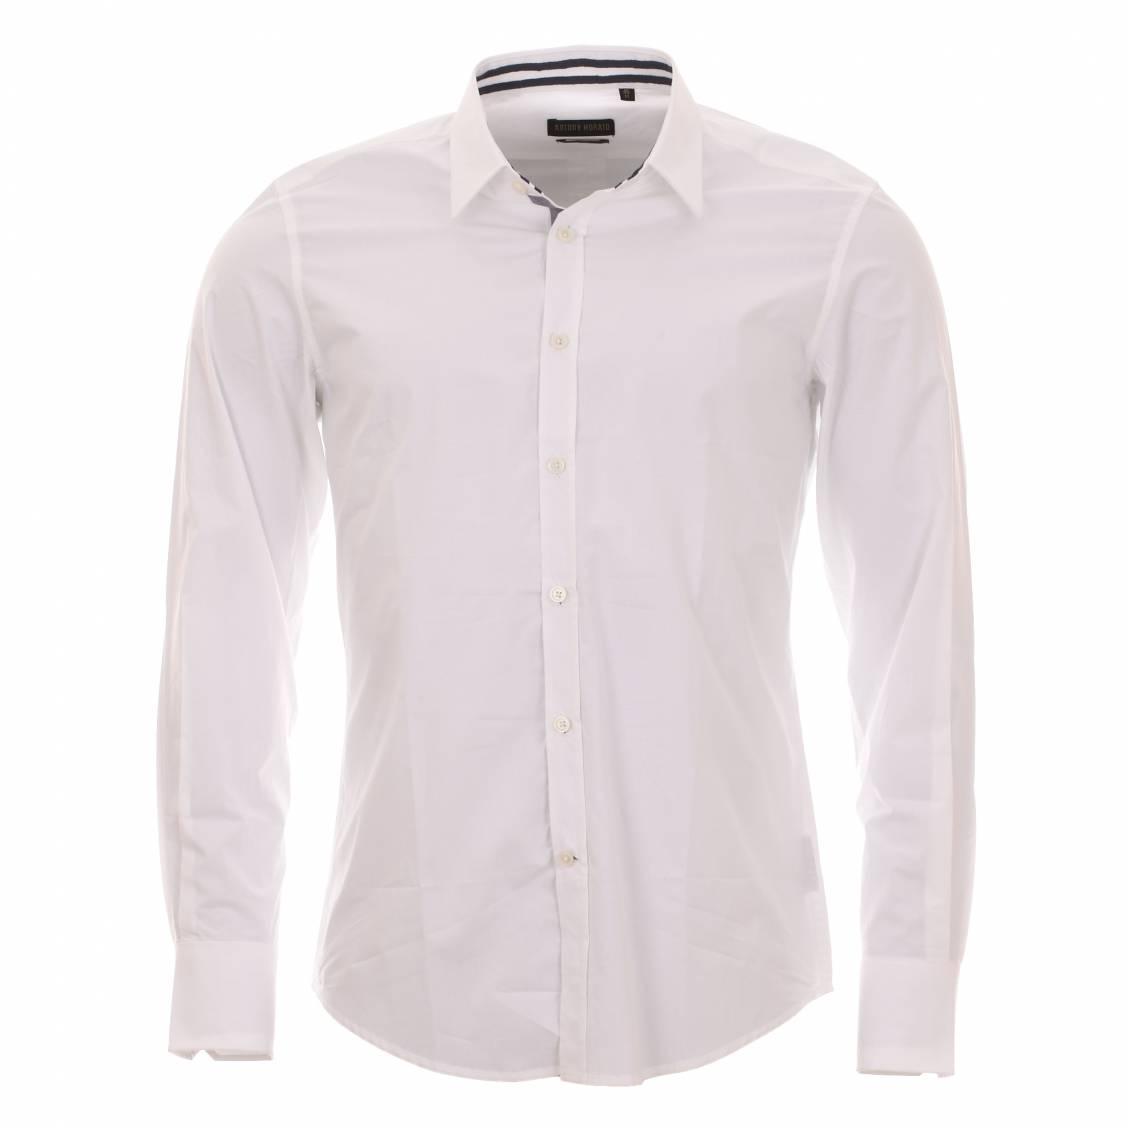 Chemise cintrée  blanche à opposition à rayures bleu marine